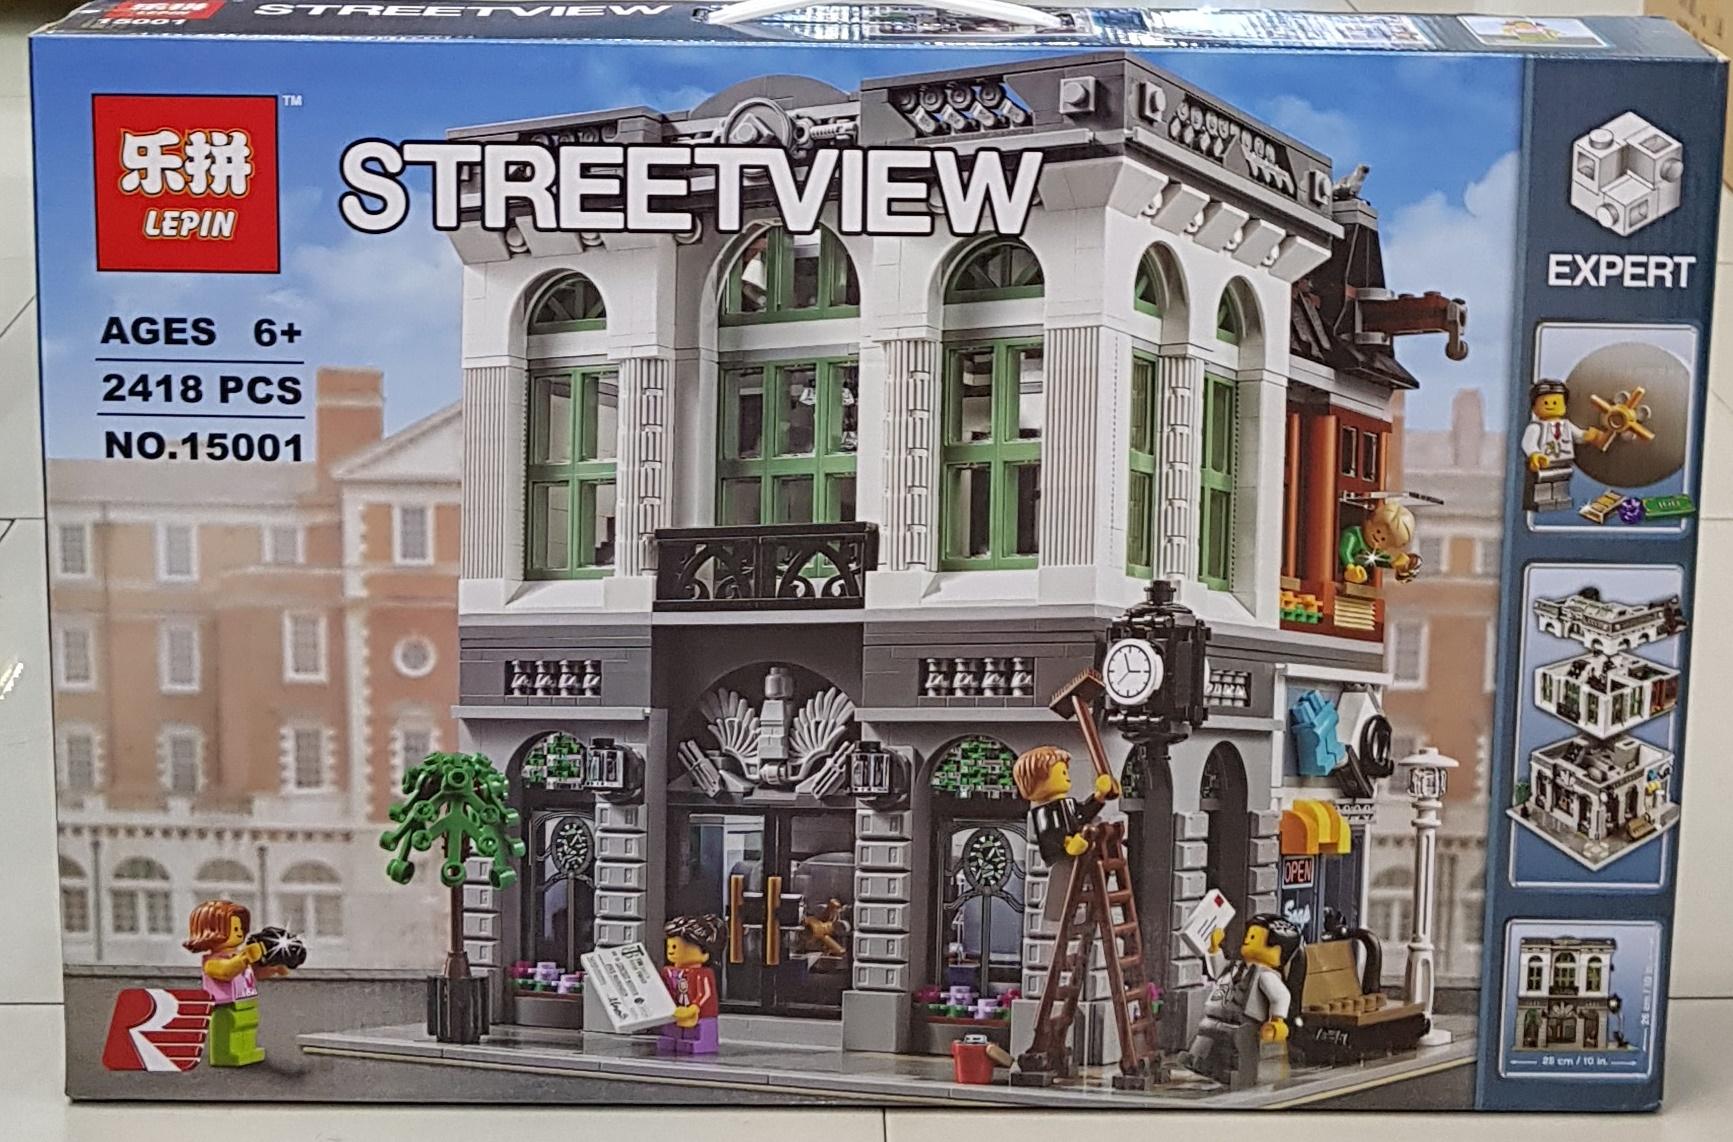 LEPIN STREETVIEW 15001 (2418ชิ้น)